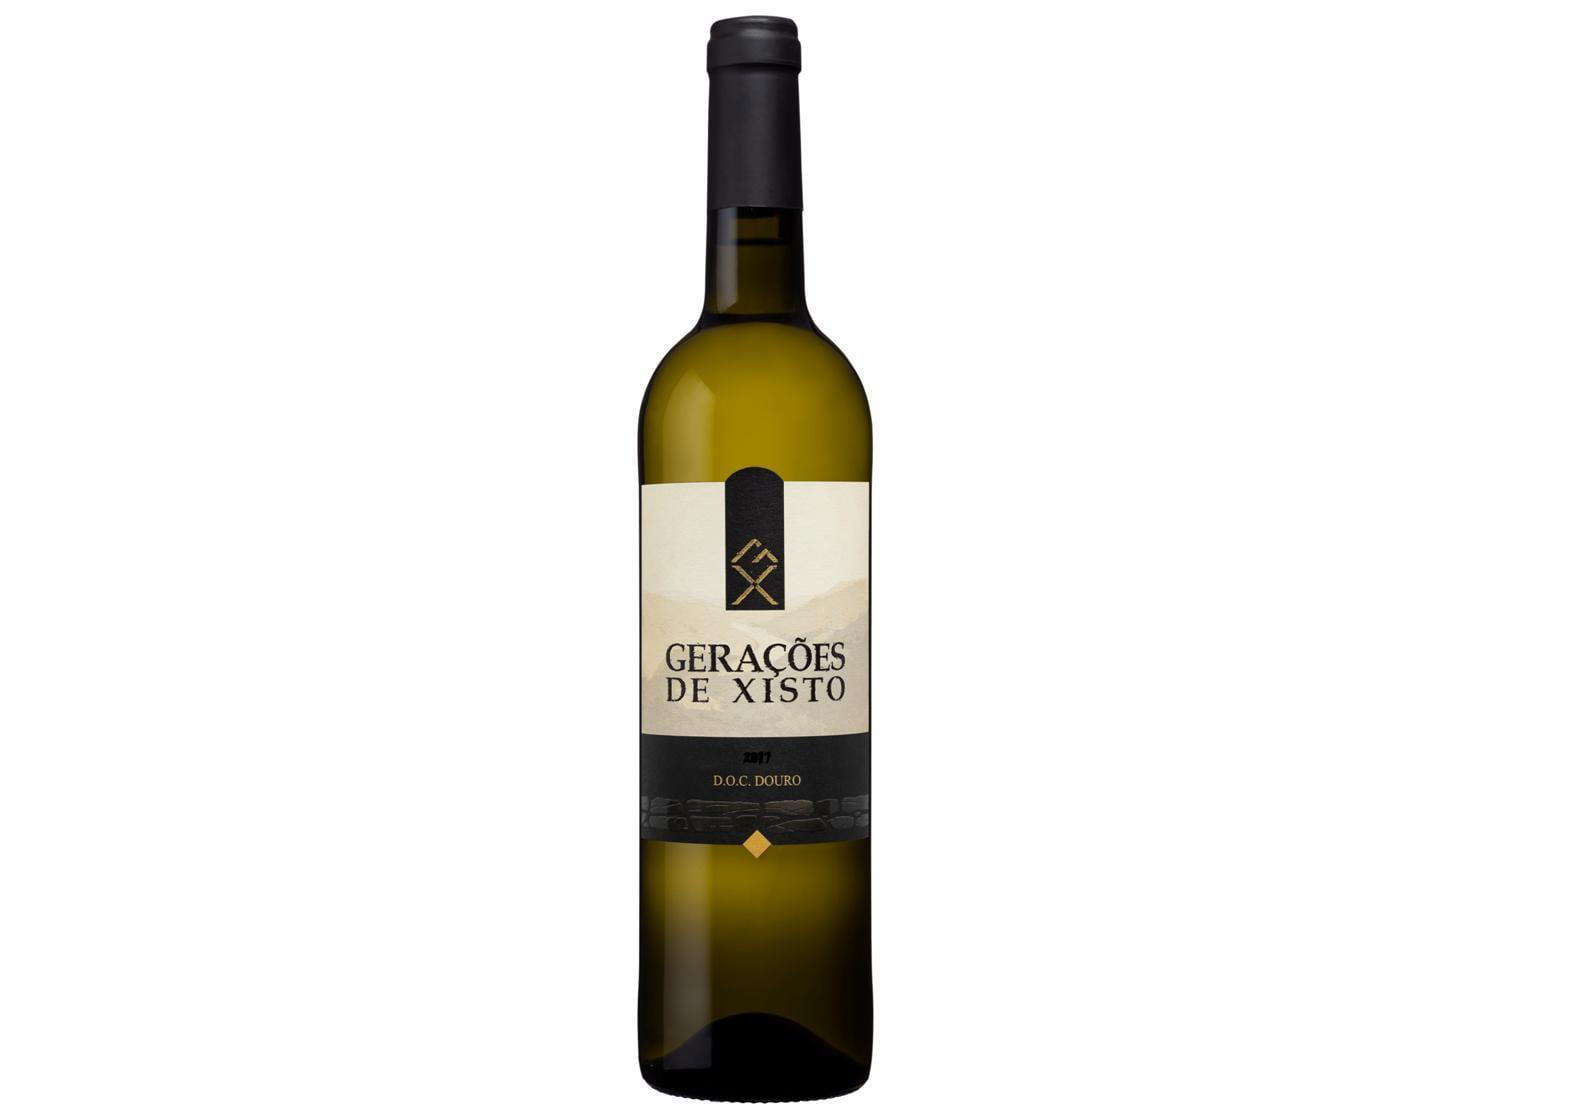 Douro Blanc - Geraçoes Xisto - Vin du Douro Portugal